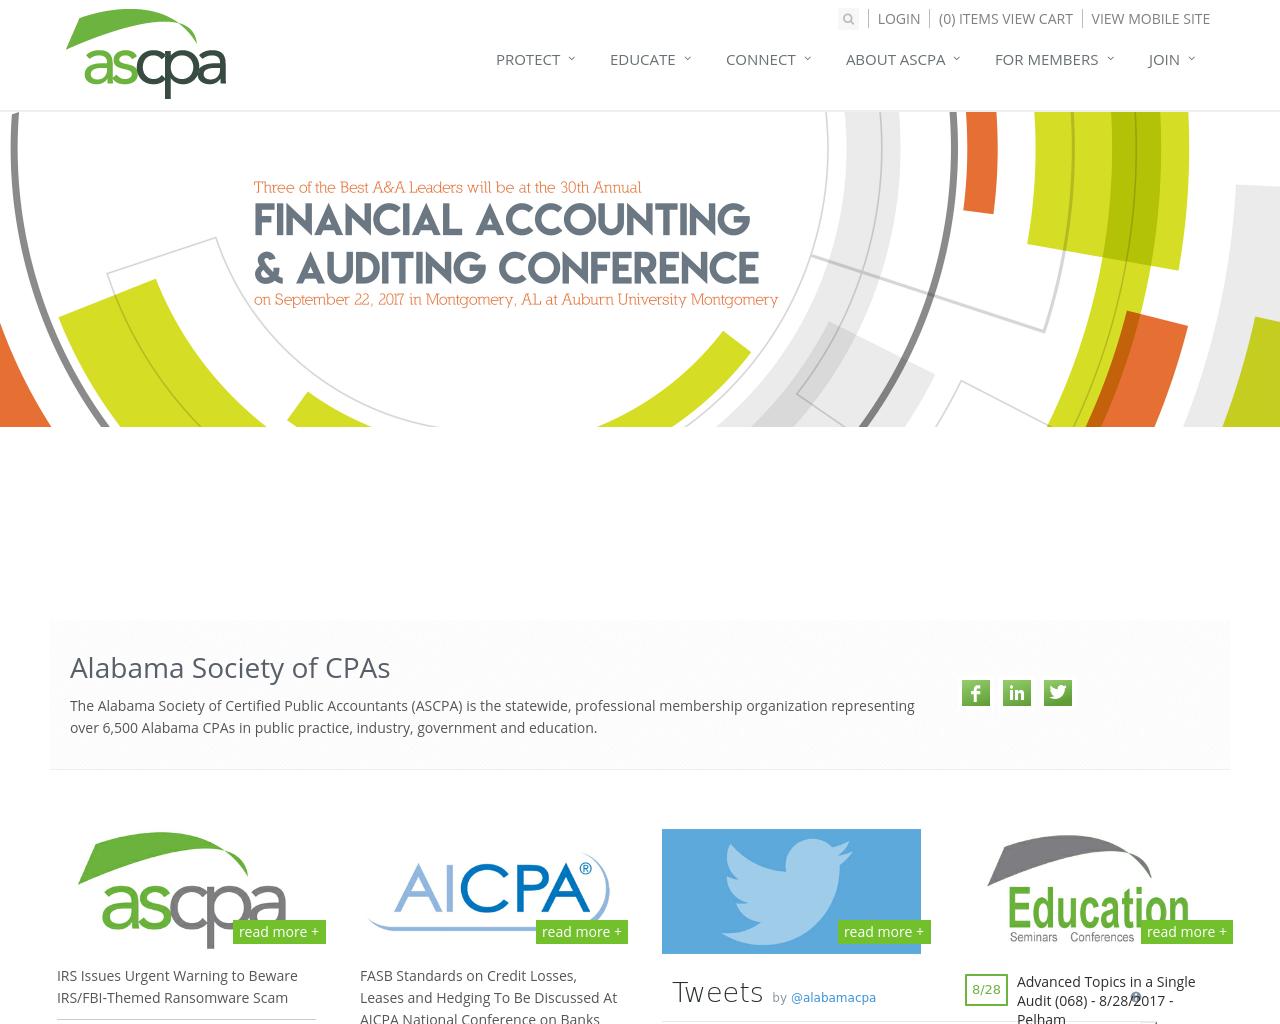 ascpa-Advertising-Reviews-Pricing